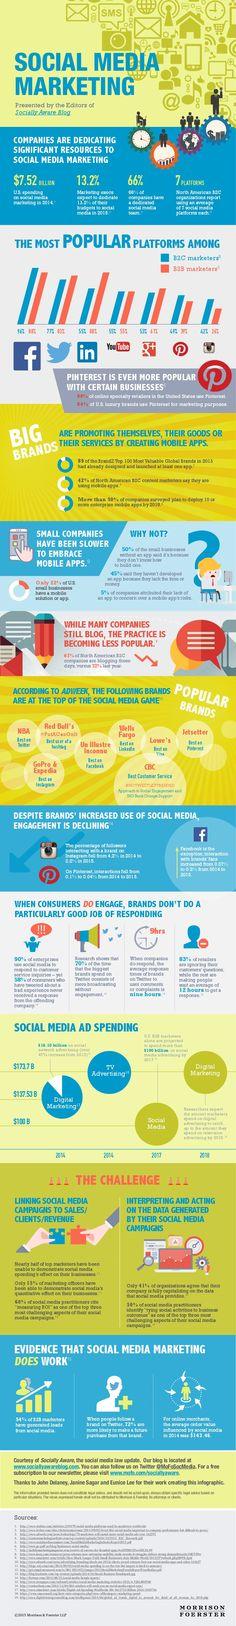 http://iab.blogosfere.it/post/533018/social-media-marketing-le-tendenze-per-il-2016?platform=hootsuite